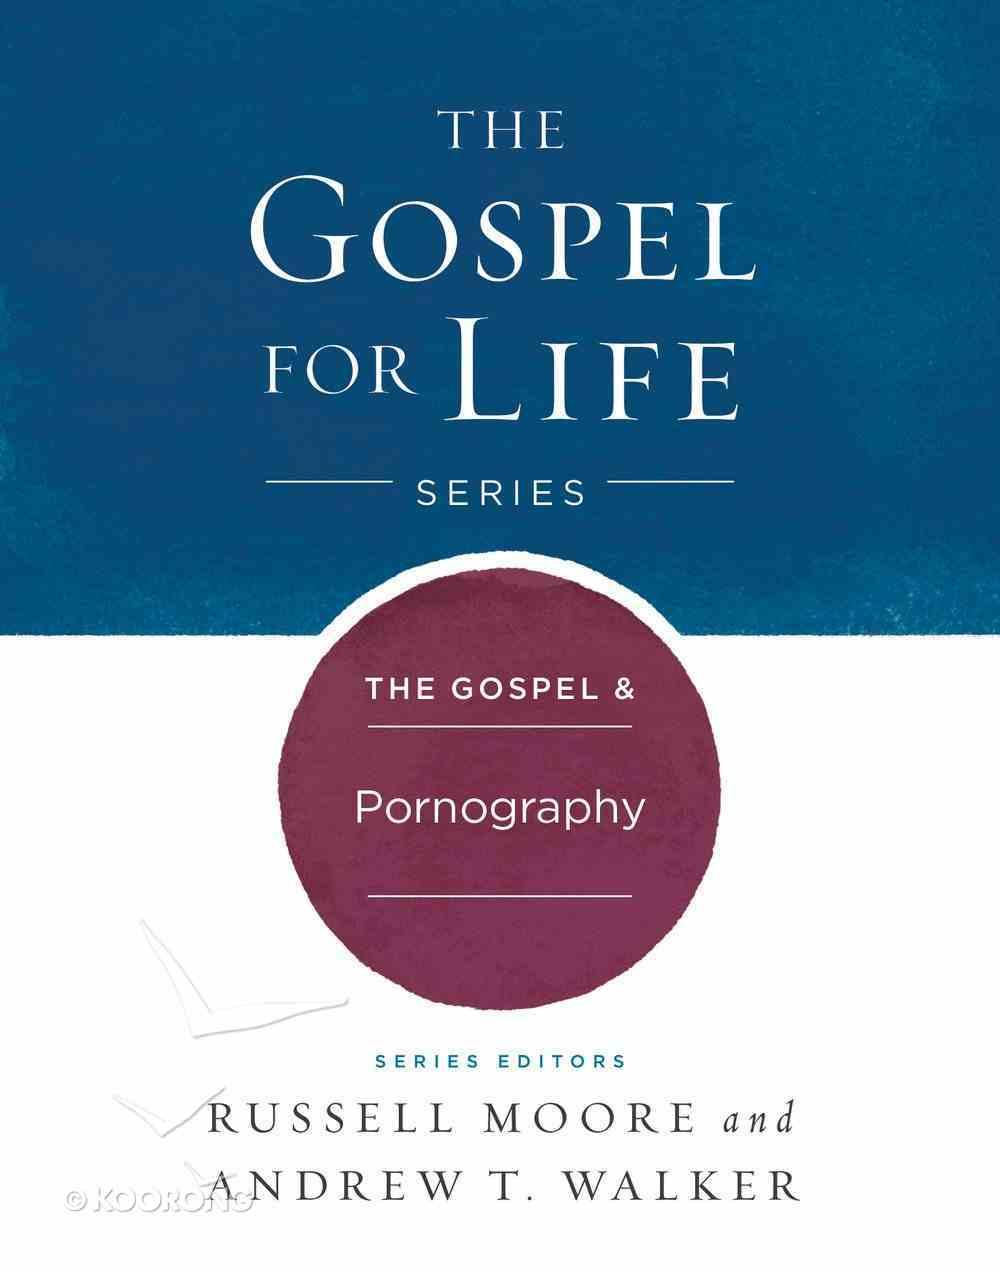 The Gospel & Pornography (Gospel For Life Series) Hardback